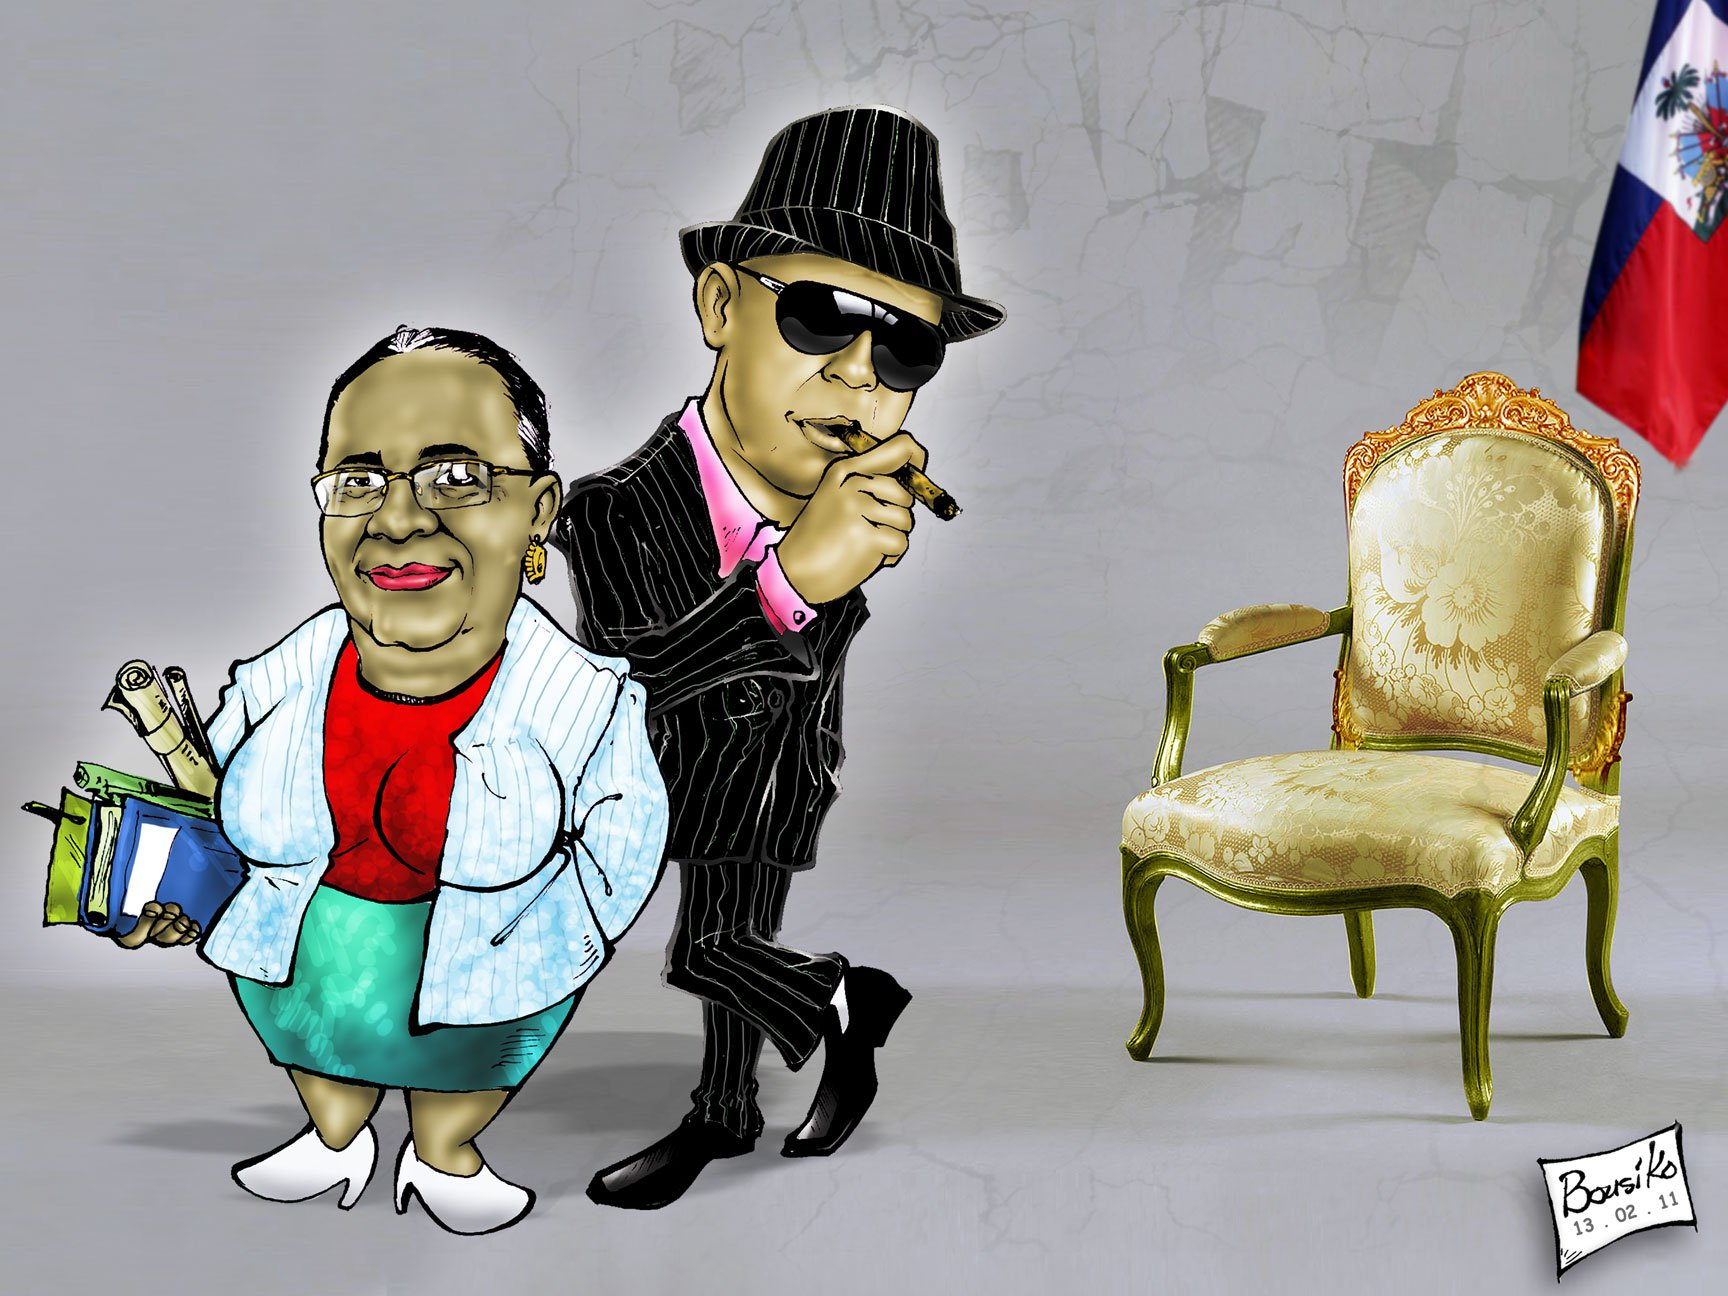 Bousiko (Jerry Boursiquot)